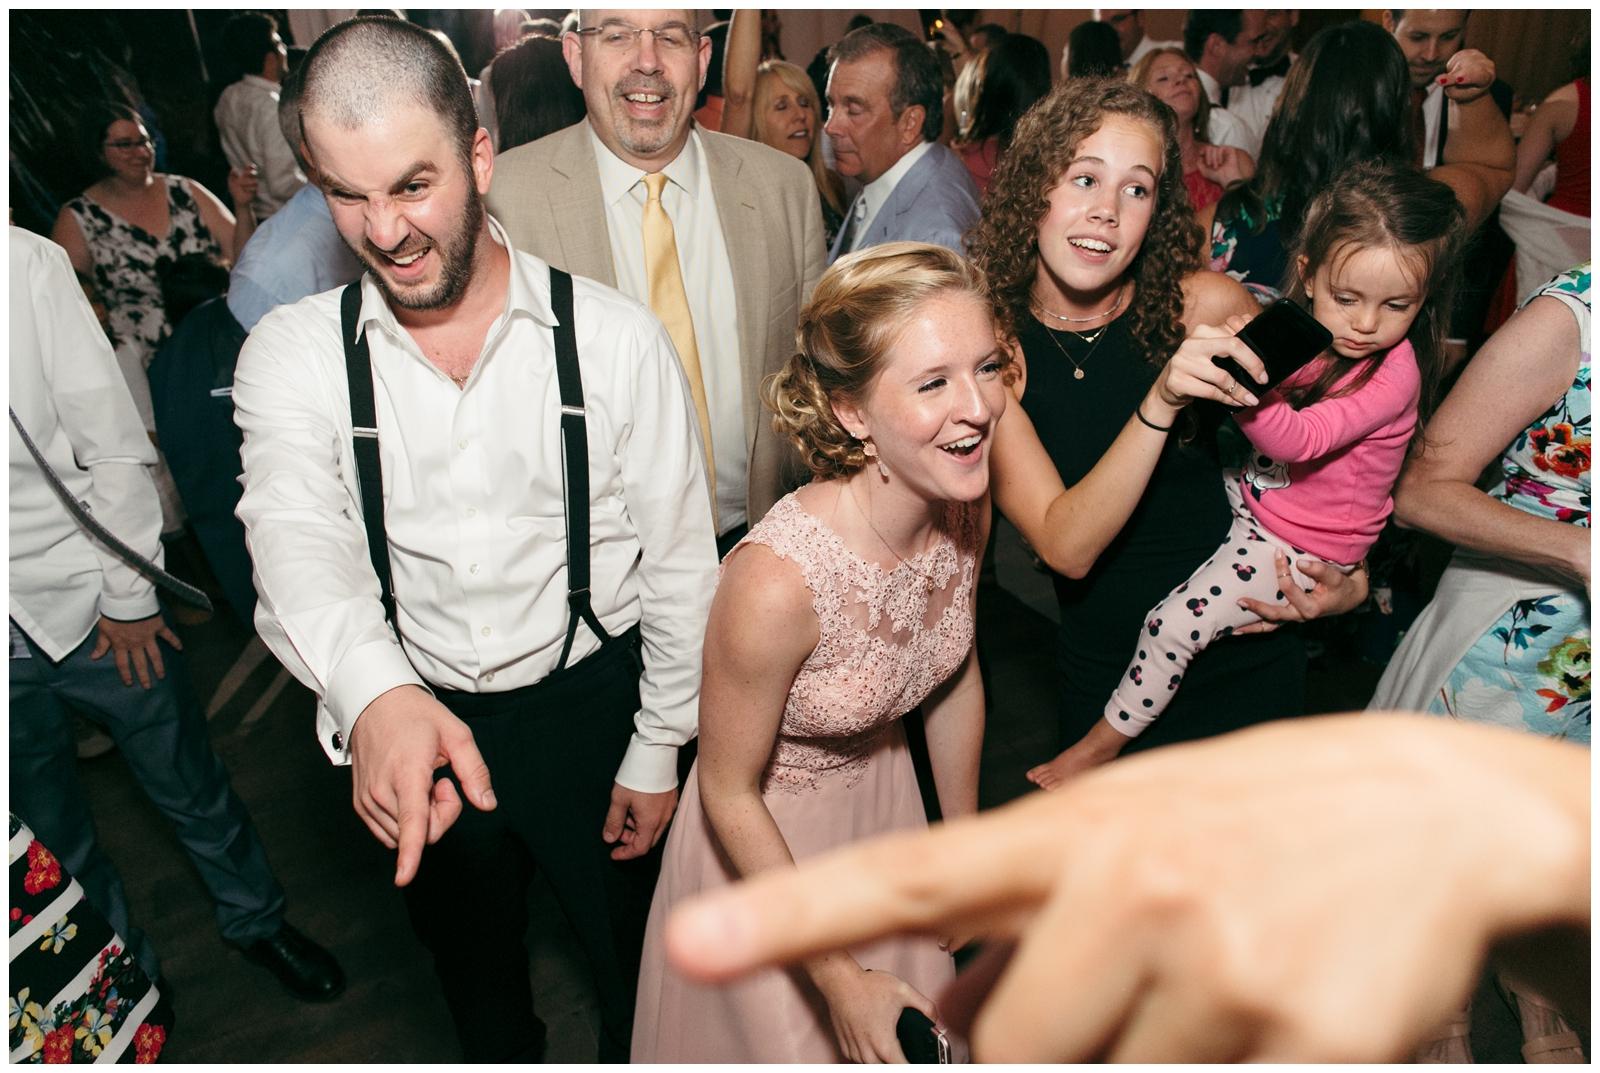 Moraine-Farm-wedding-Bailey-Q-Photo-Massachusetts-wedding-photpgrapher-163.jpg